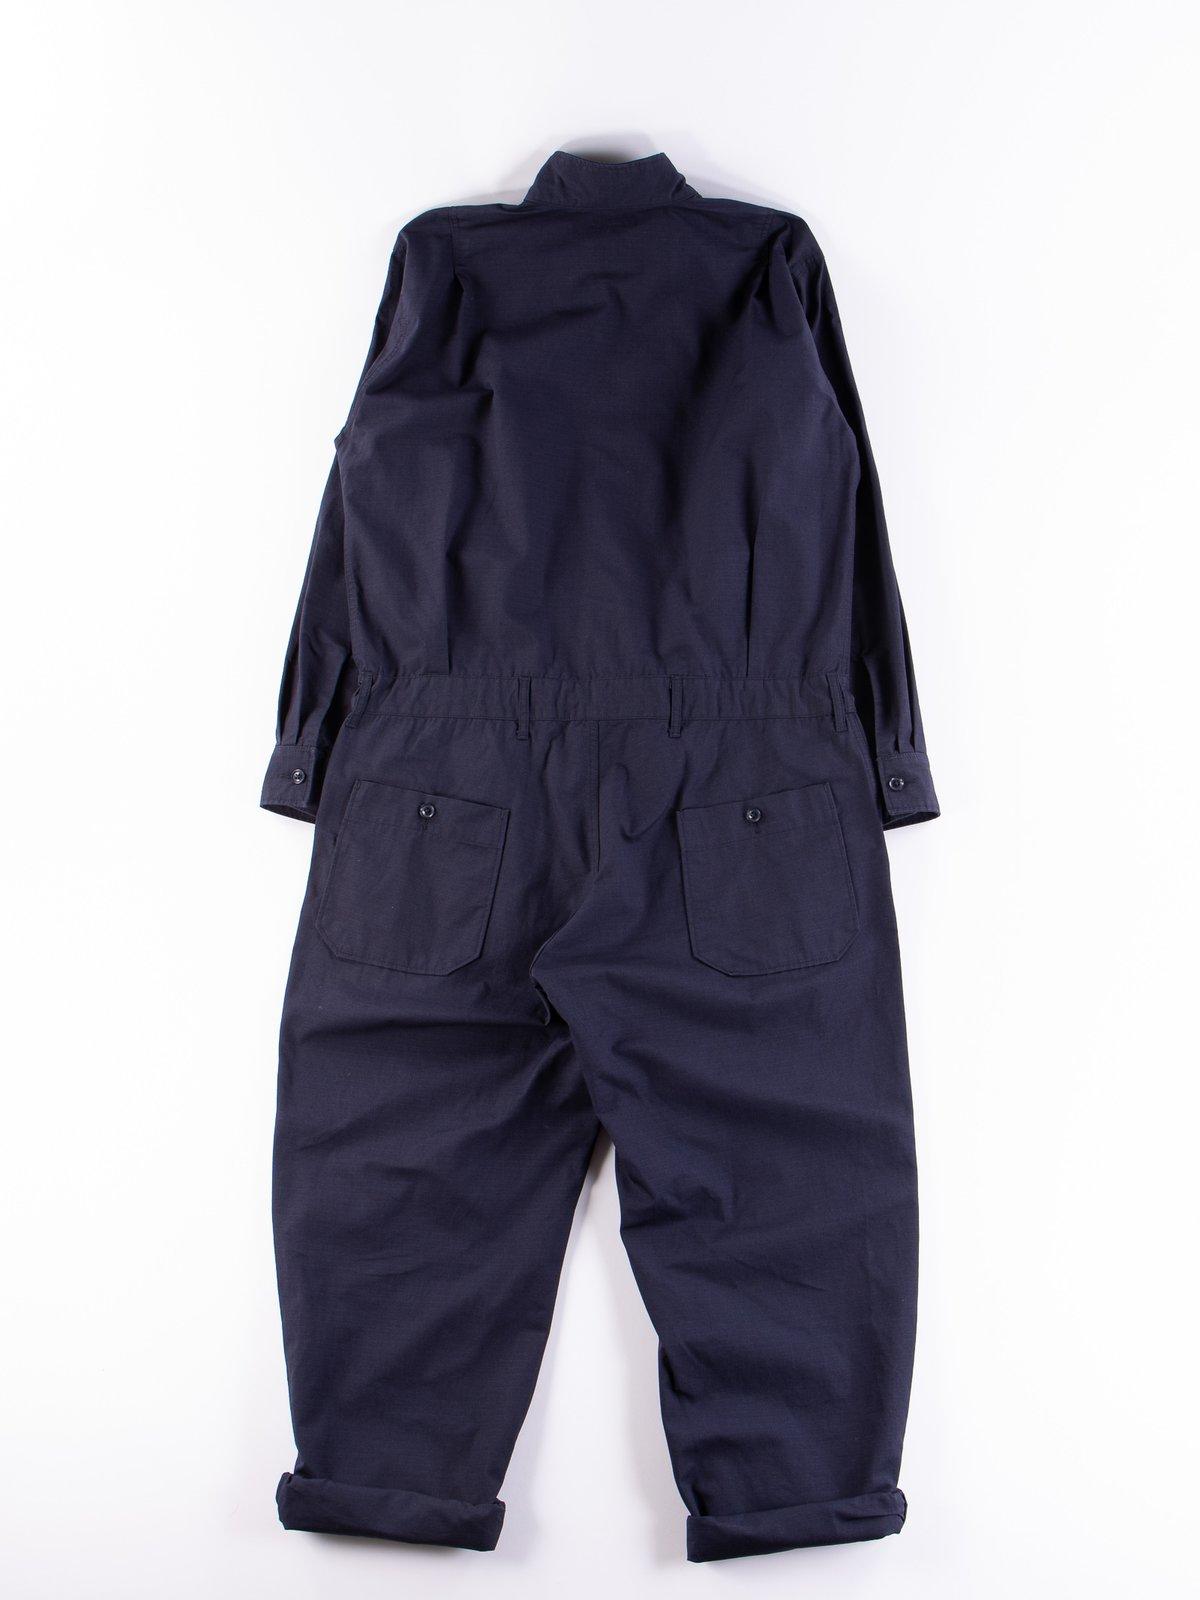 Dark Navy Cotton Ripstop Boiler Suit - Image 7